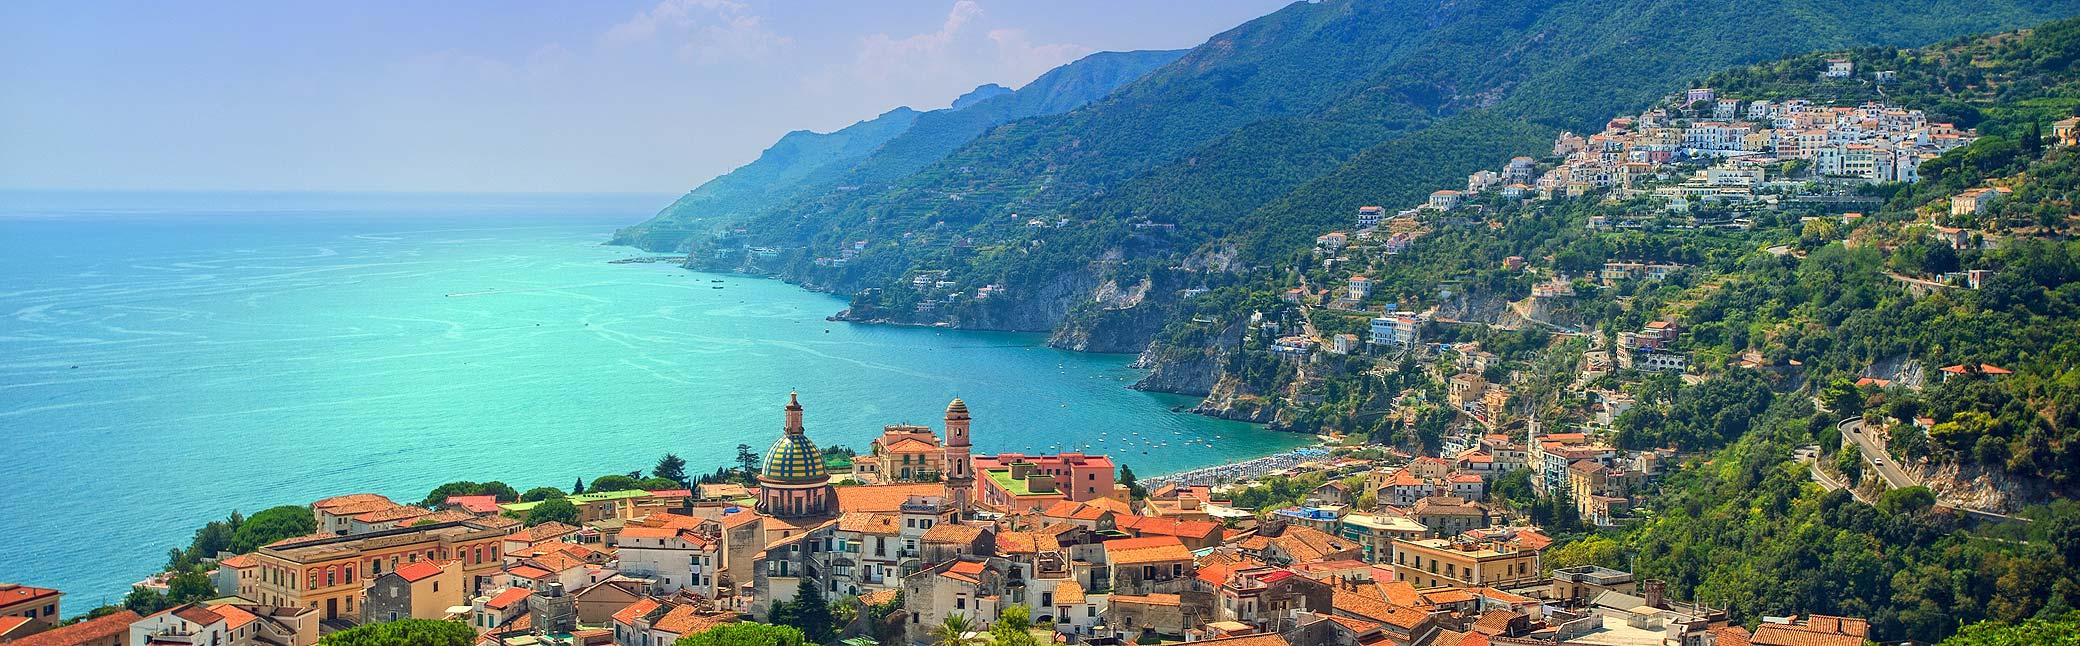 amalfi coast cheap last minute rentals